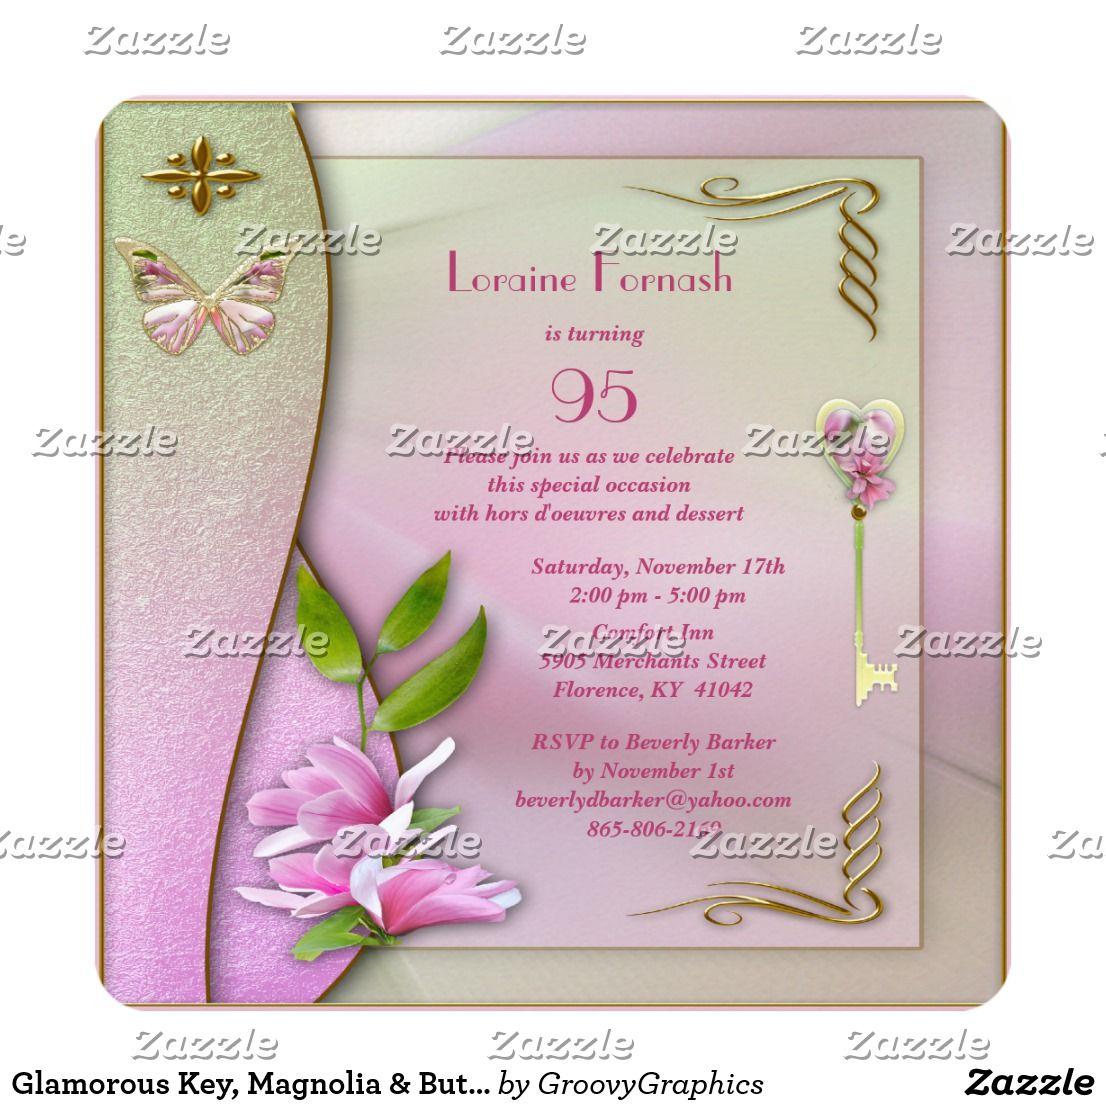 Glamorous Key Magnolia Butterfly 90th Birthday Invitation